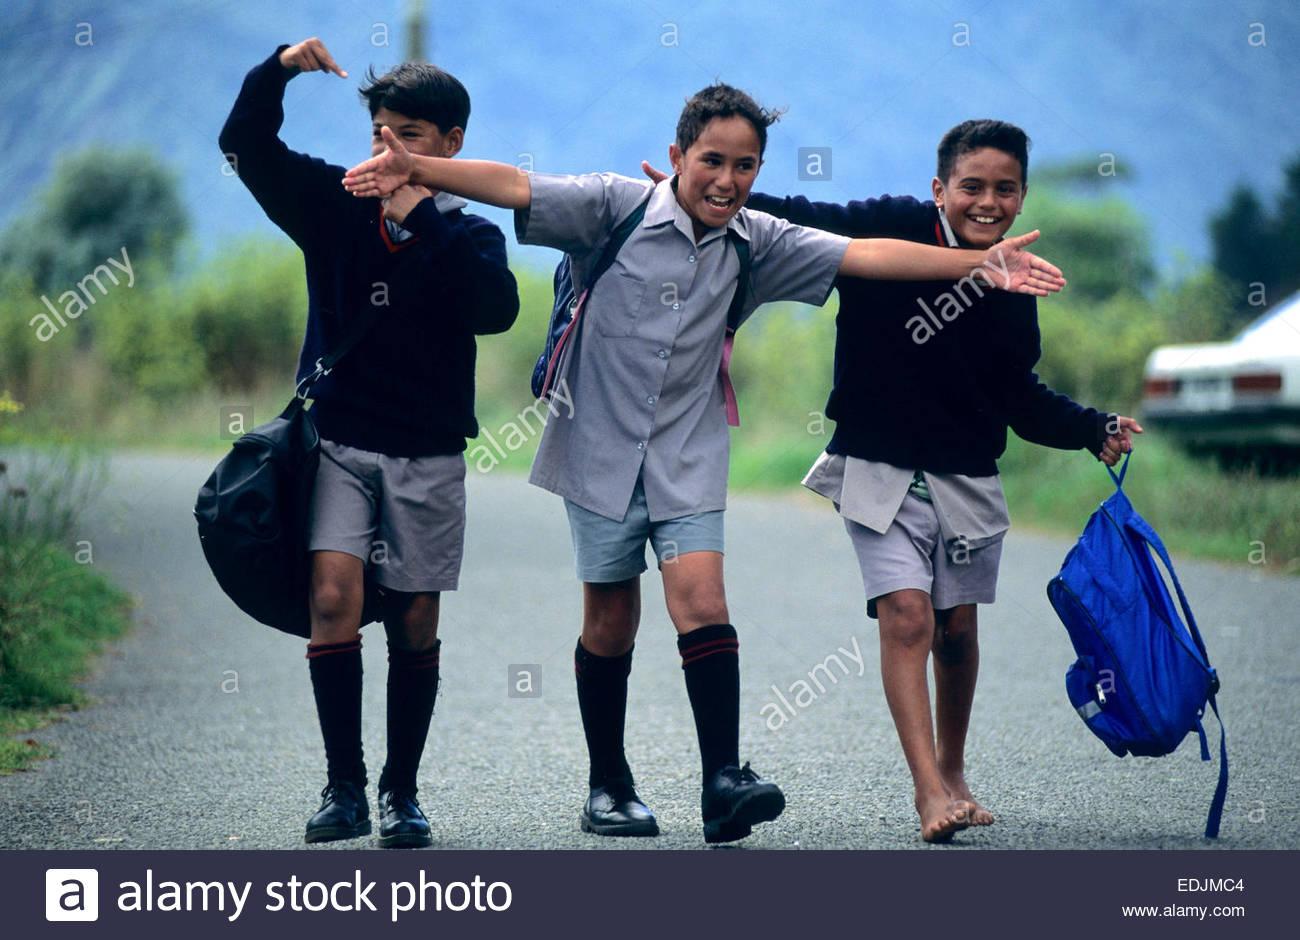 Young Maori schoolboys, Kura Kaupapa school, North Island, New Zealand. - Stock Image